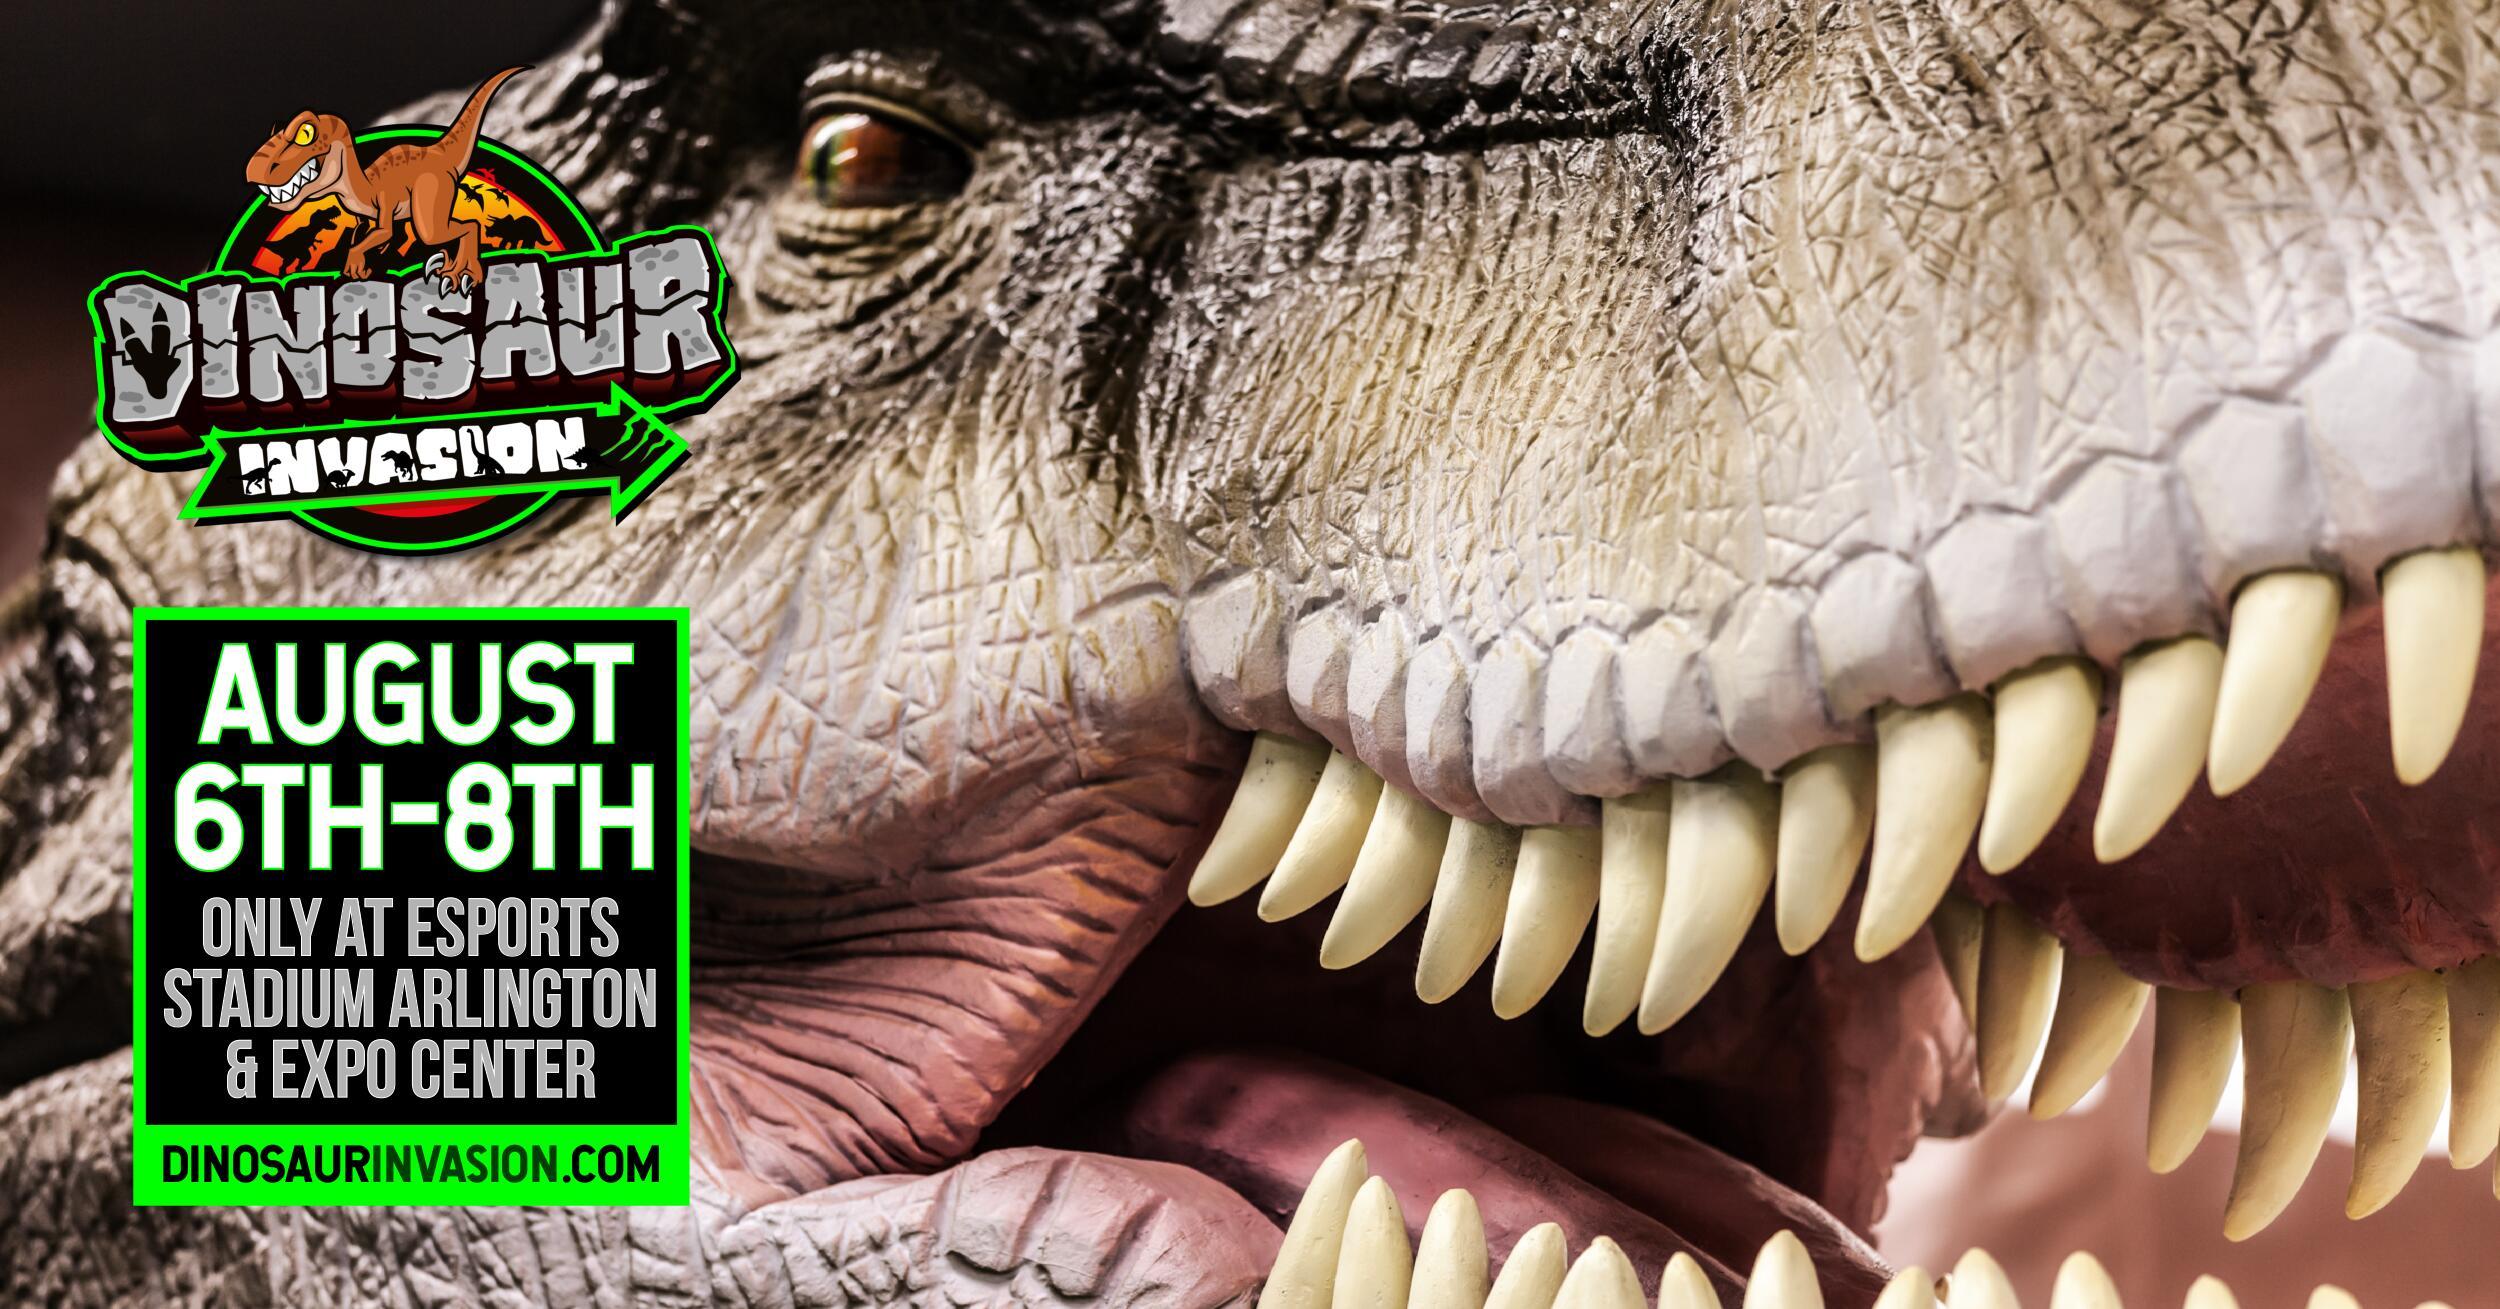 Dinosaur Invasion reviews | Amusement Parks at 9067 Southern Blvd. - West Palm Beach FL